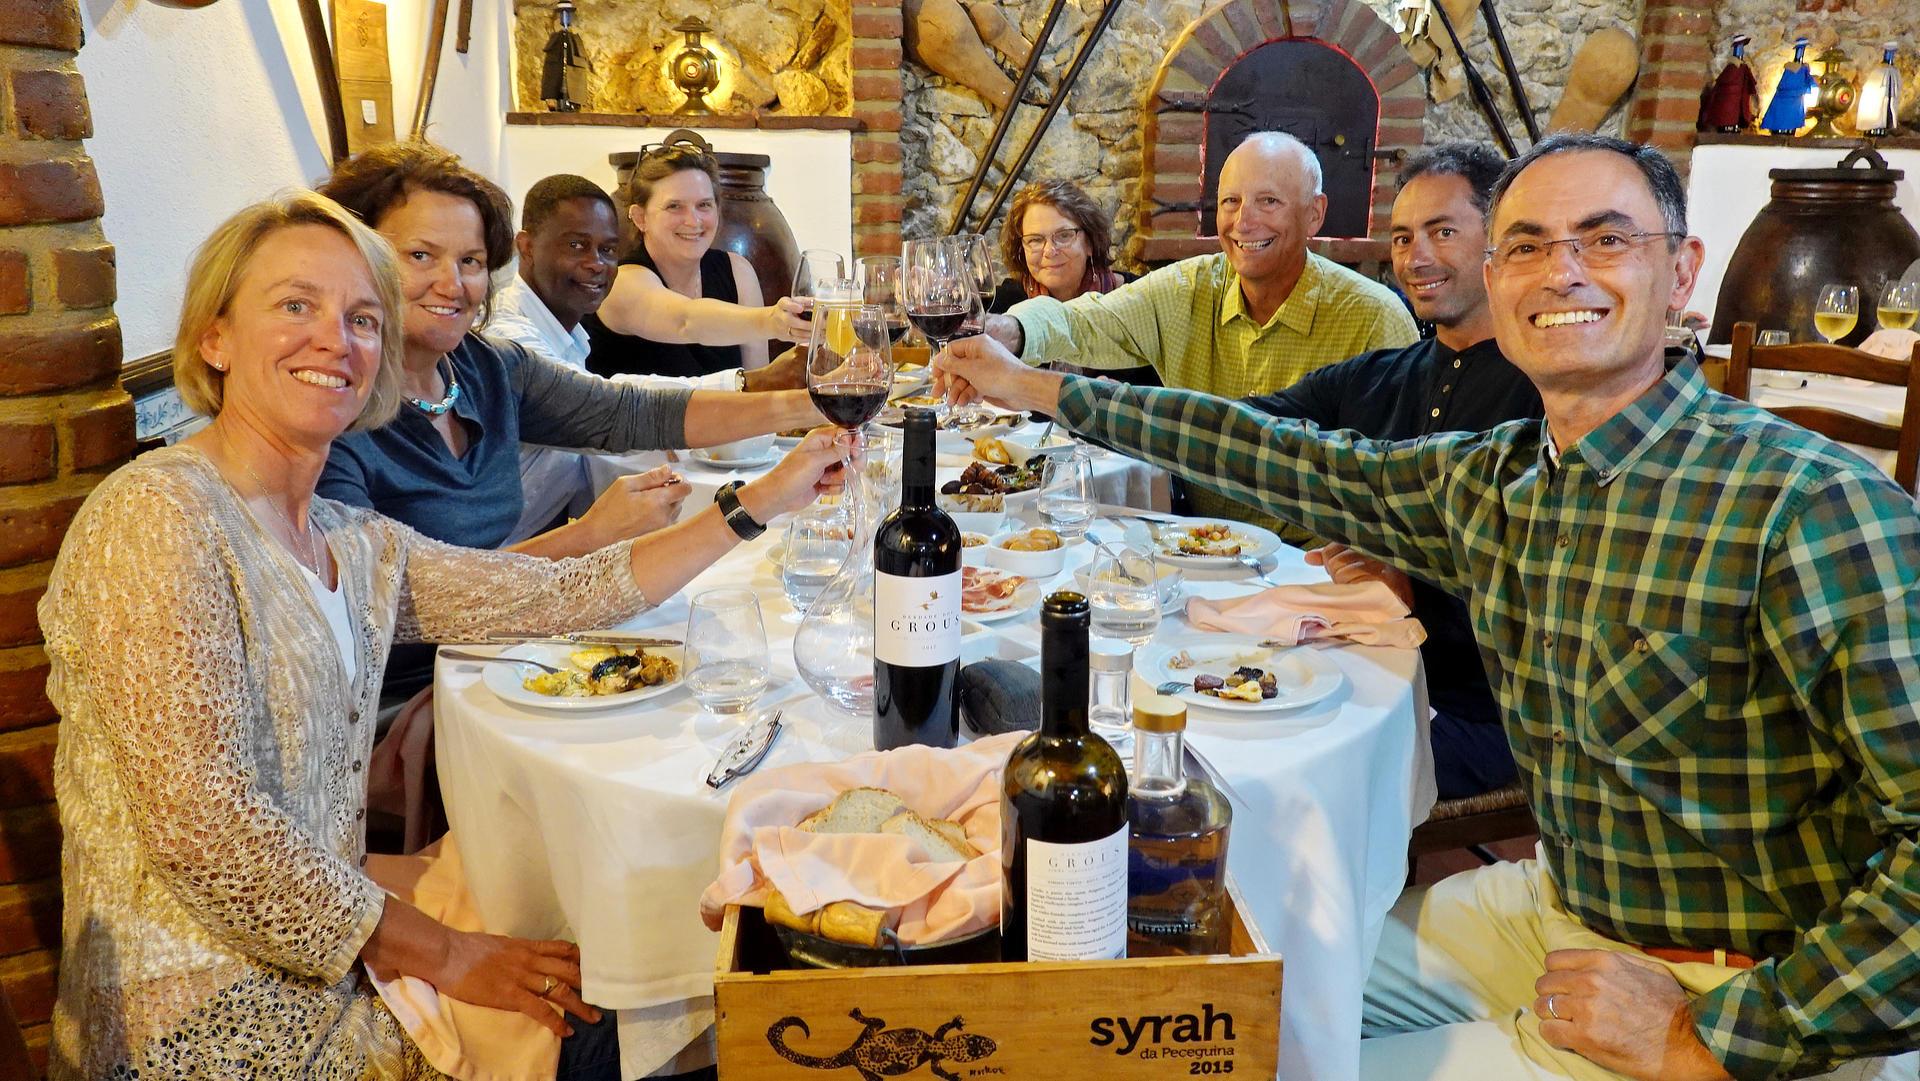 Cycling the Alentejo Wine Region at The Restaurant